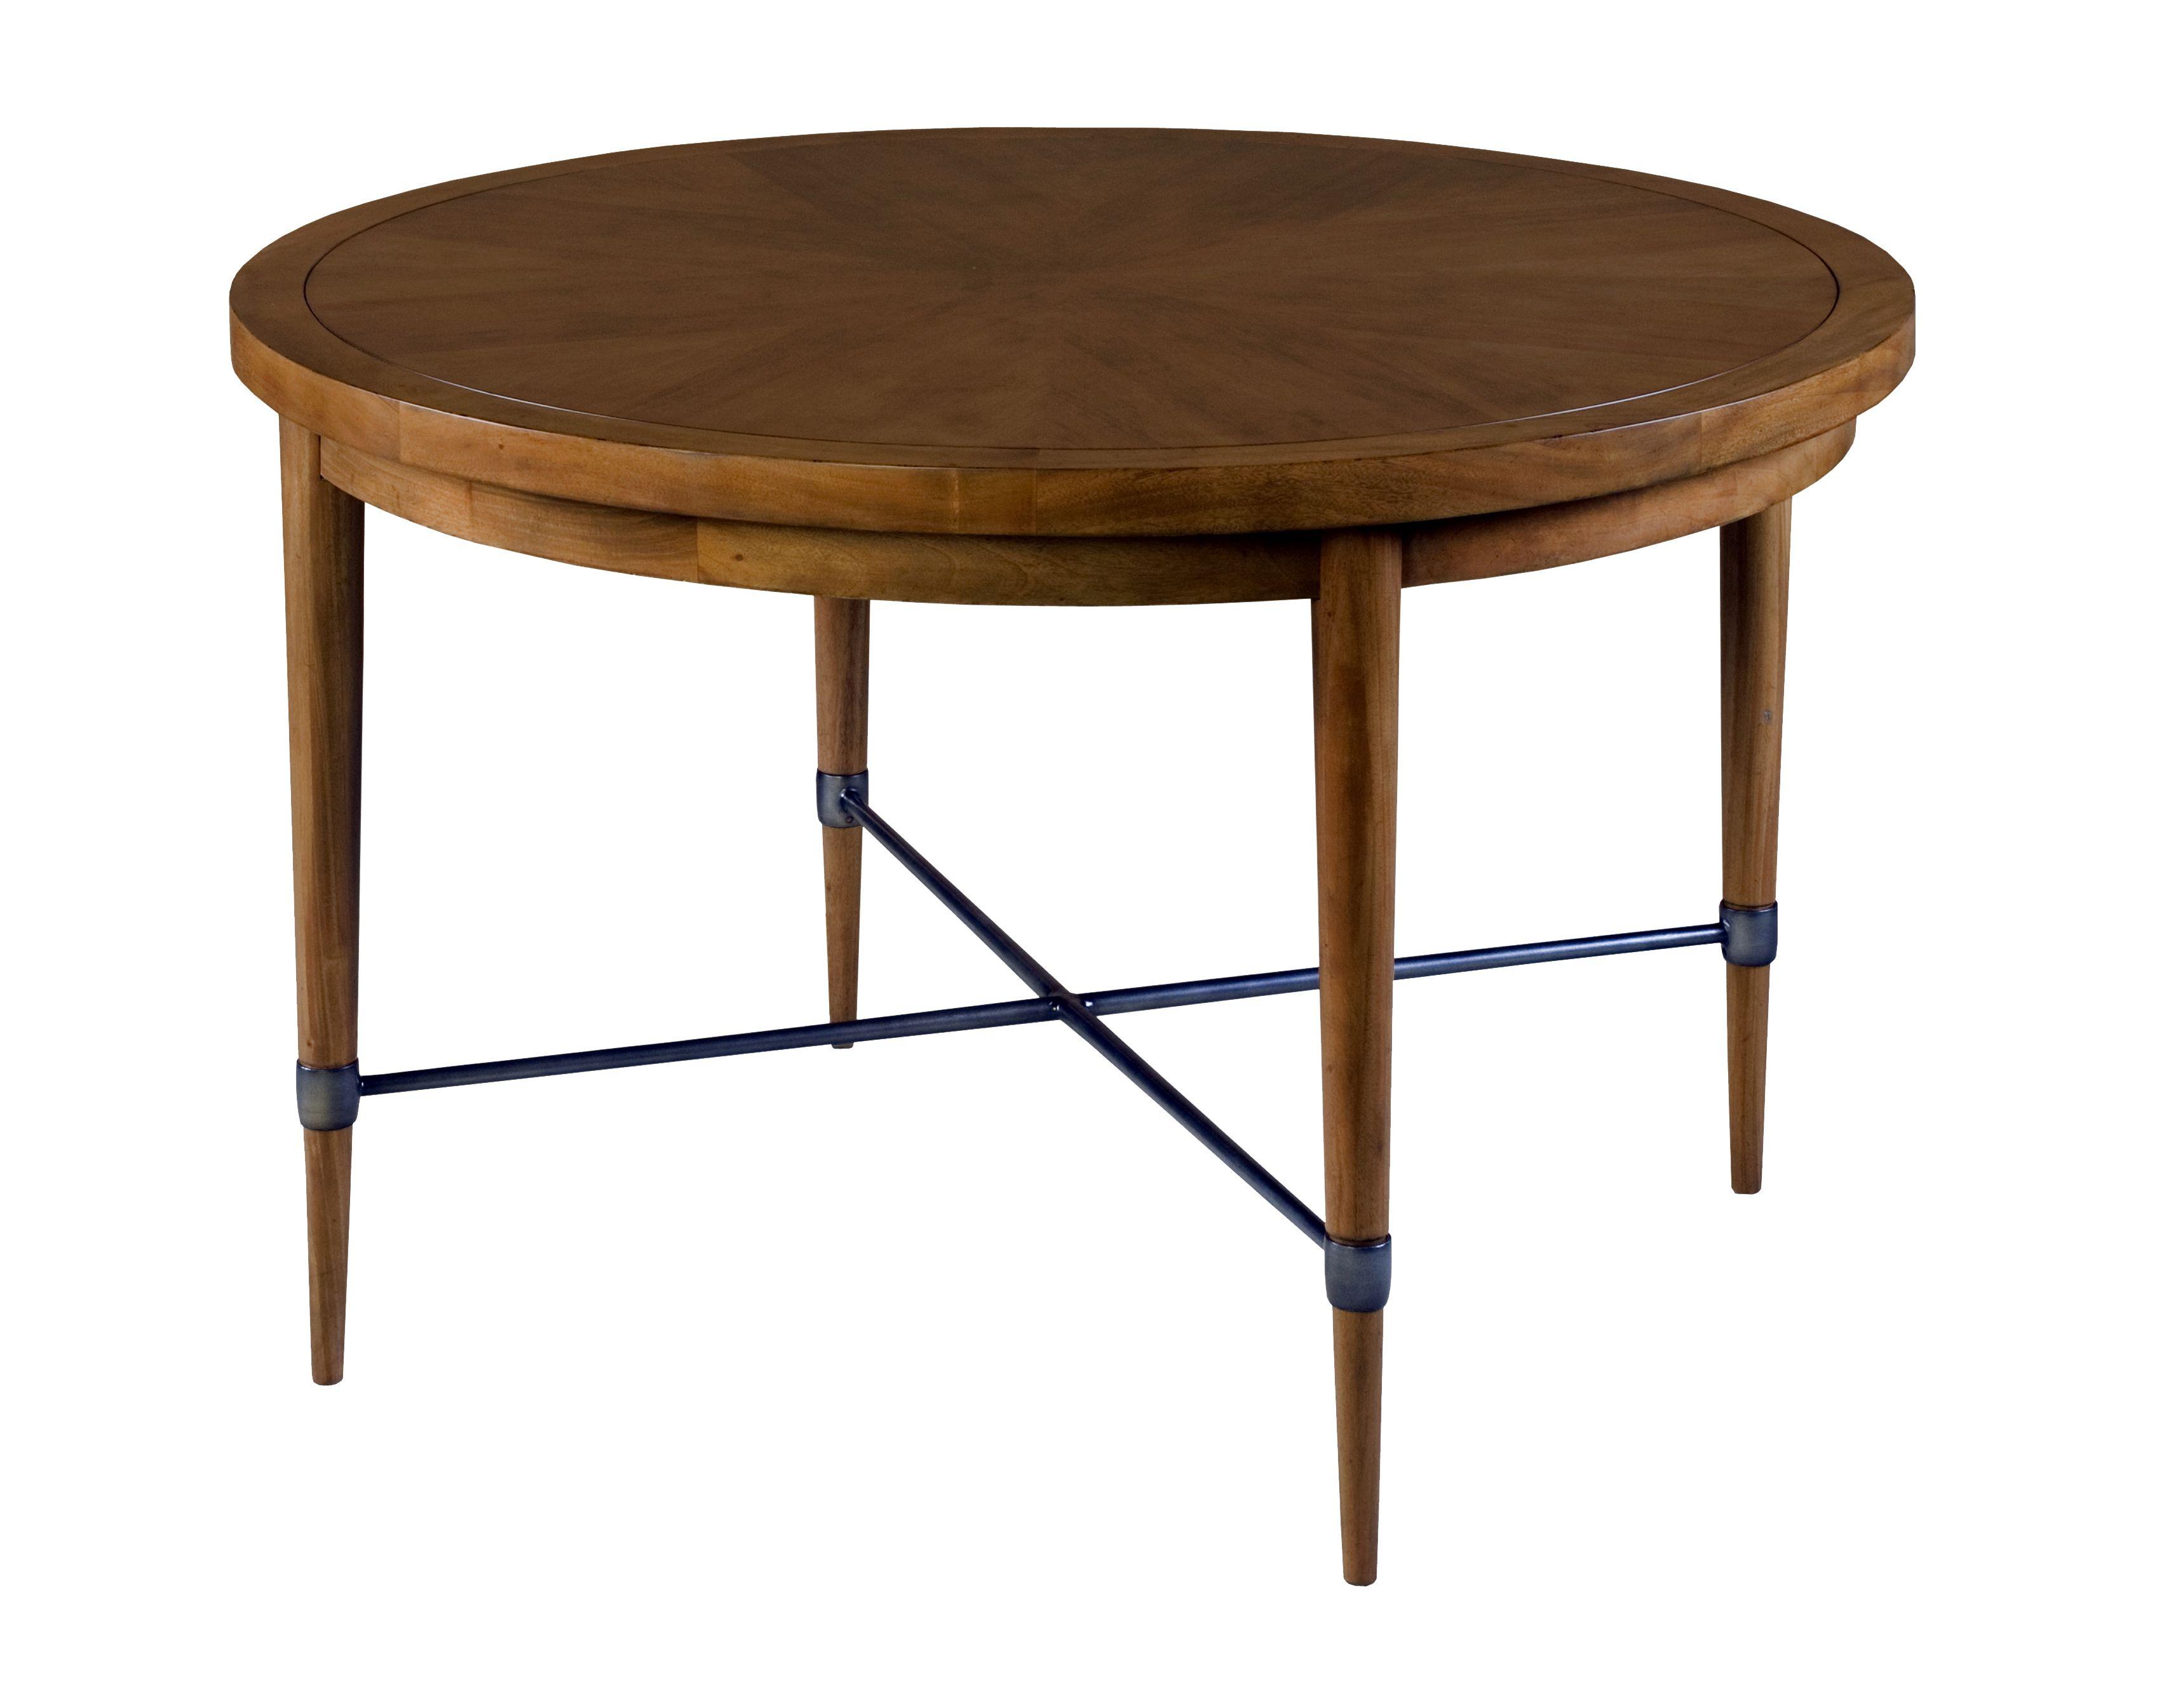 Milo Round Dining Table